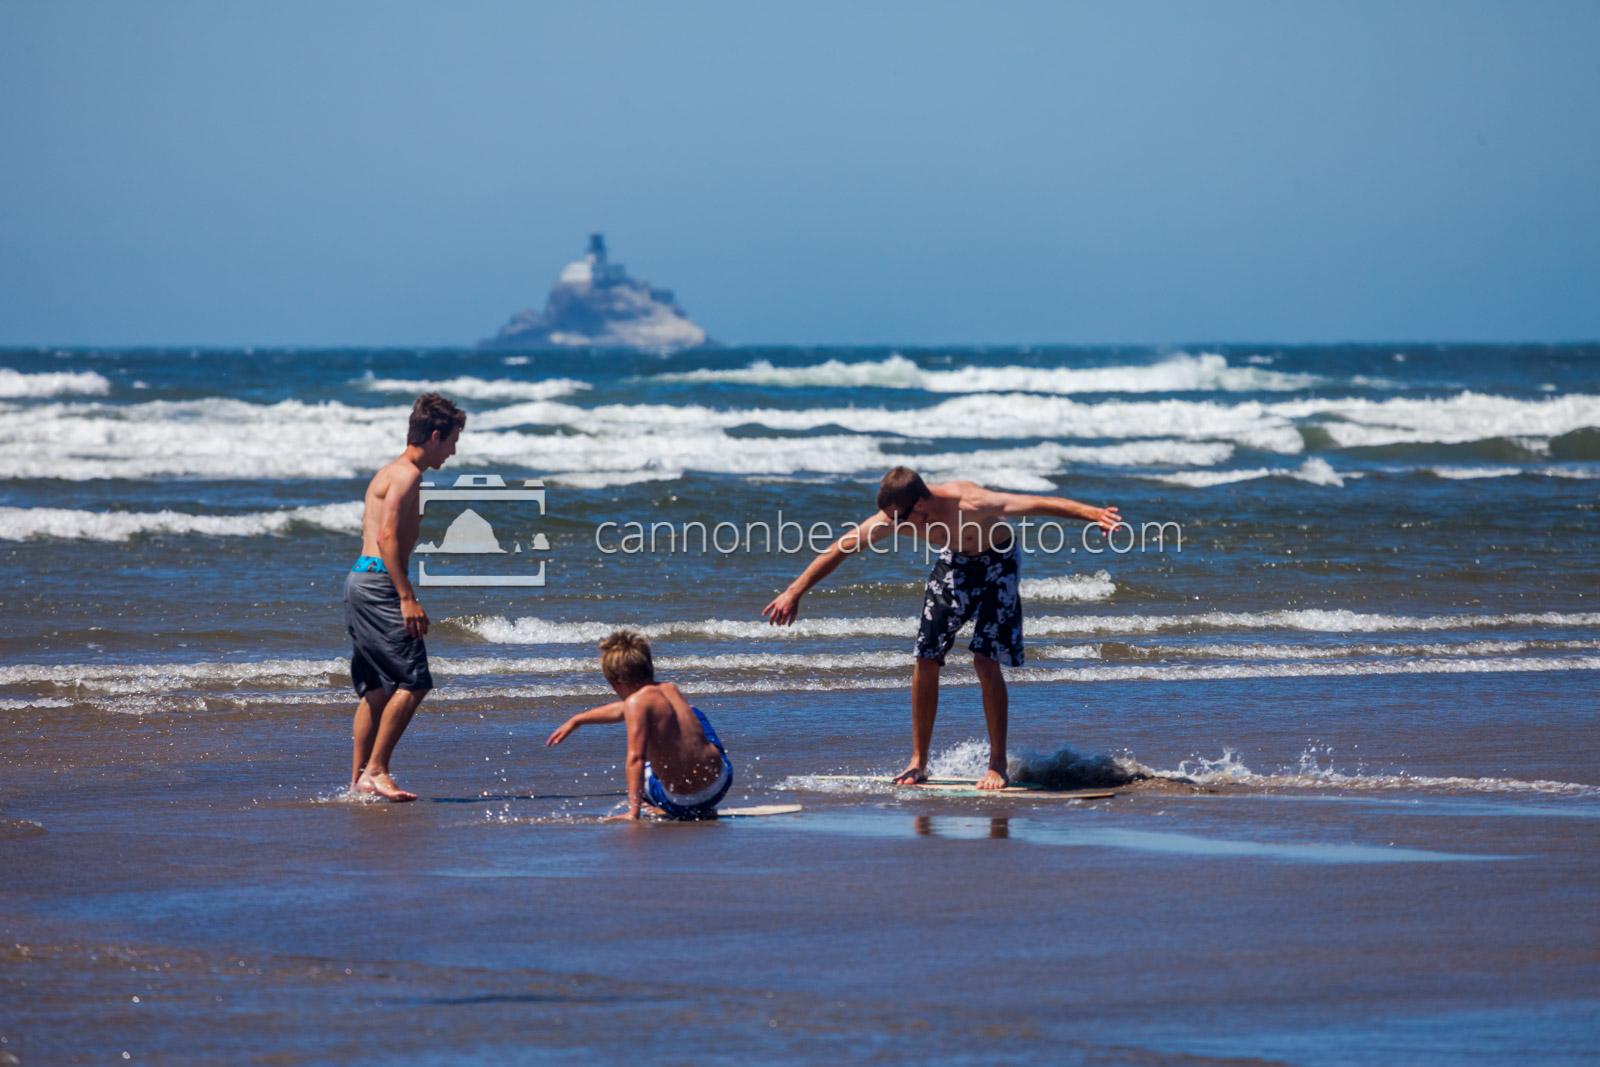 Boys Skimboarding in Cannon Beach 2